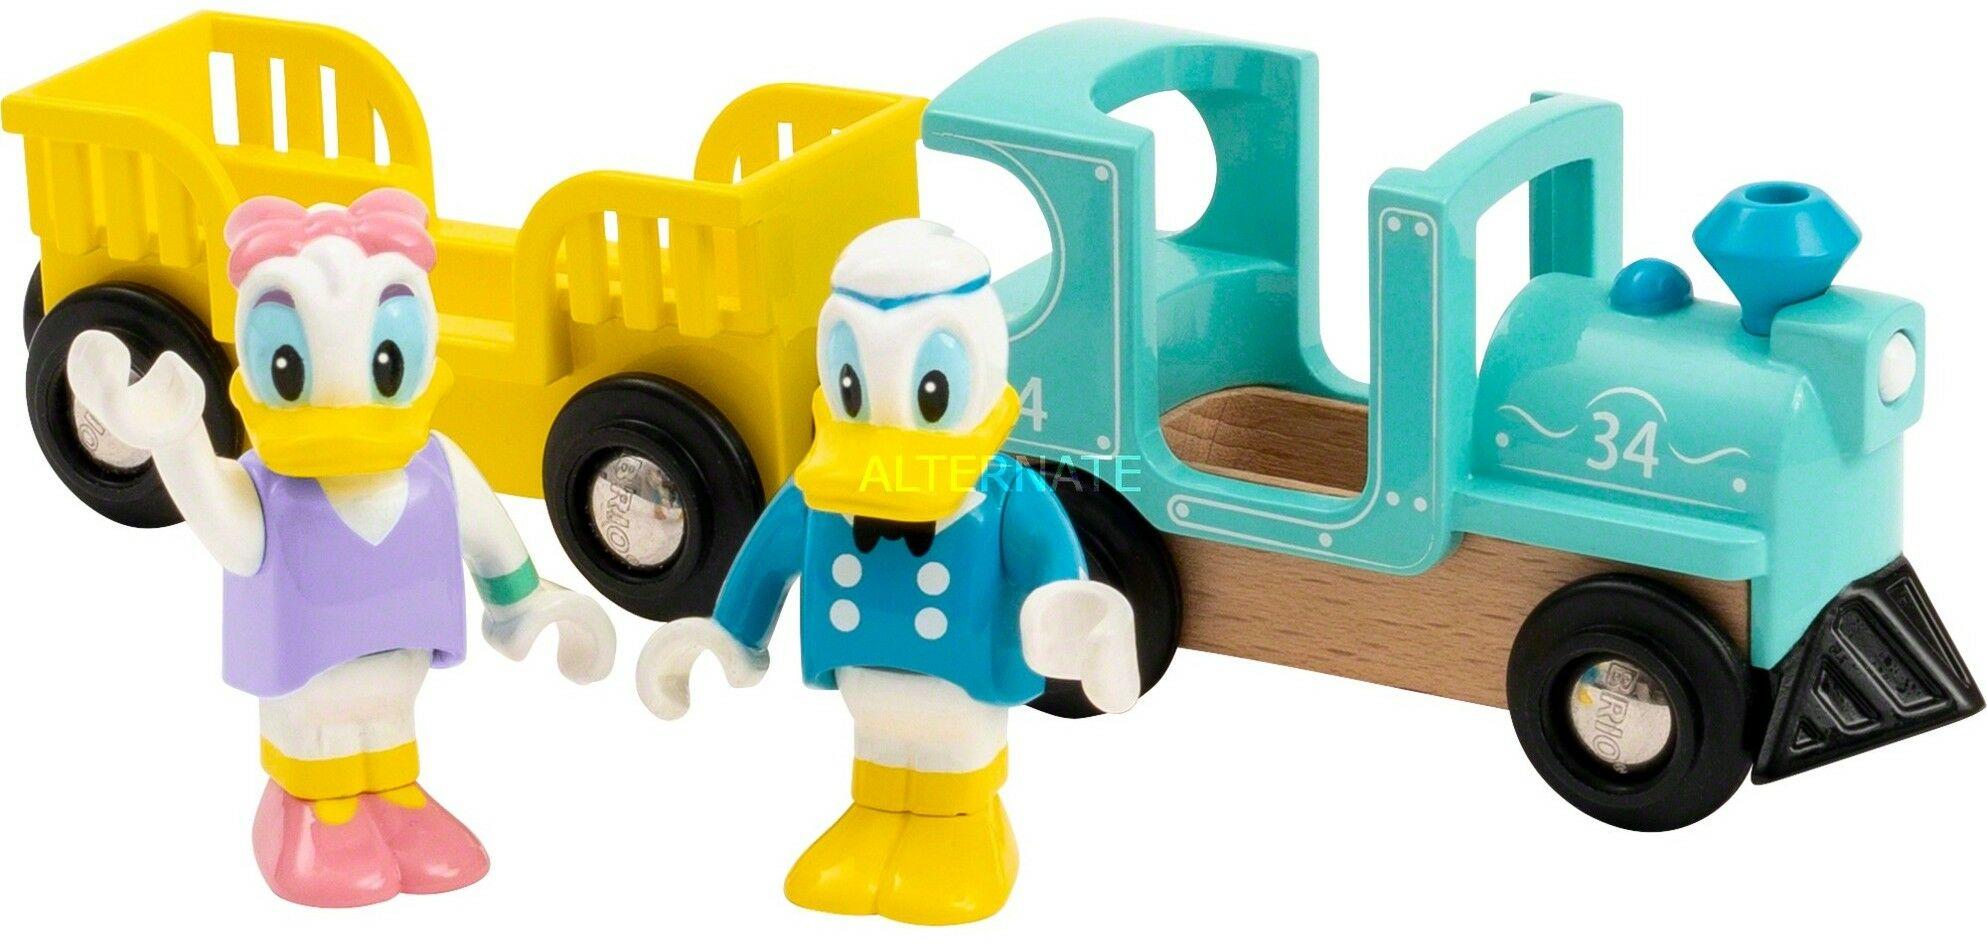 BRIO - Brio Retro Pociąg Kaczora Donalda i Daisy